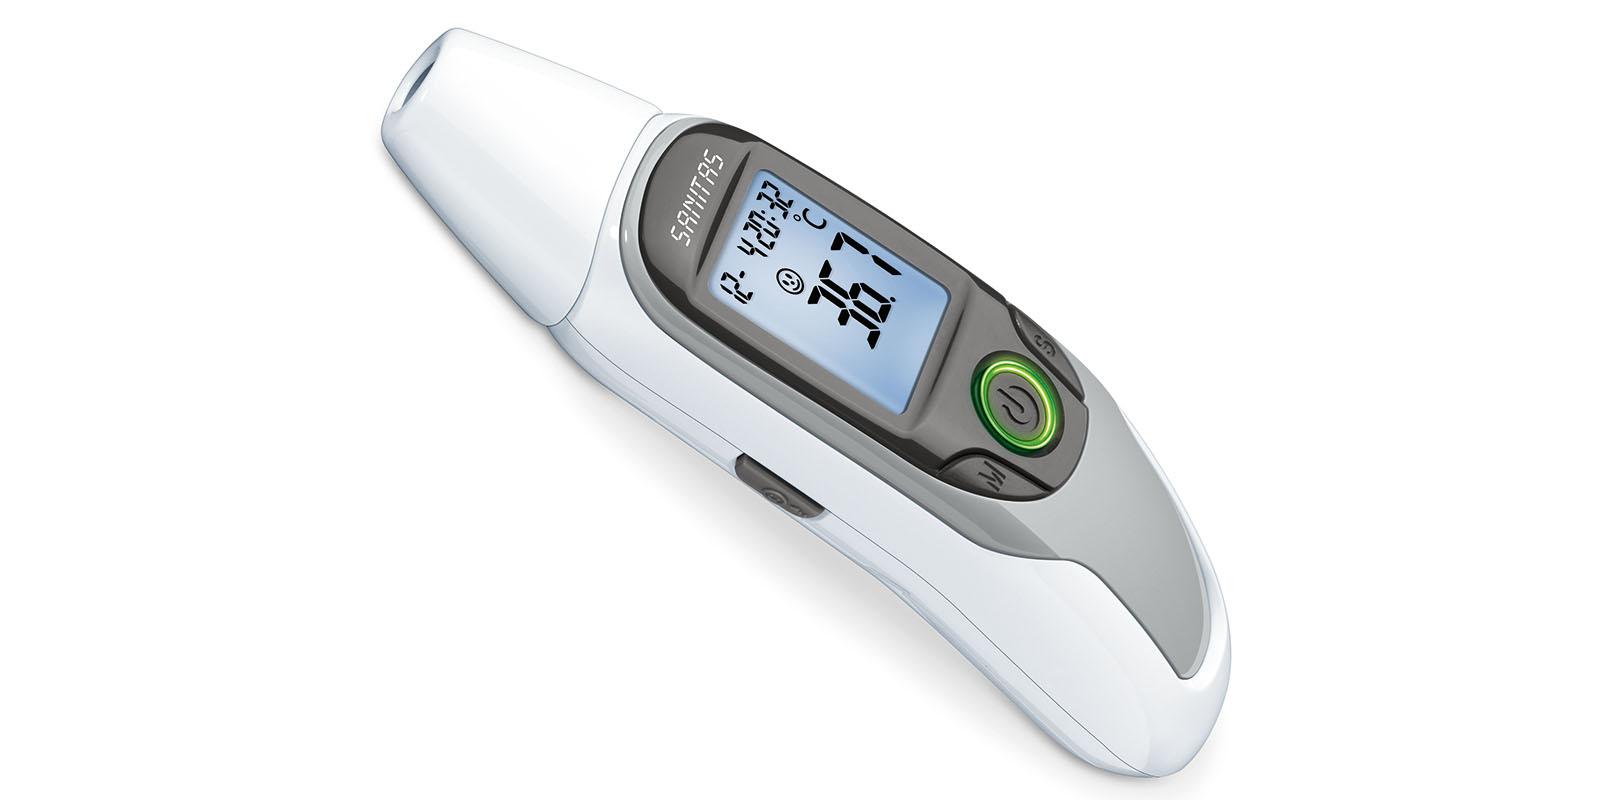 Sanitas Sft 75 Multifunktions Thermometer Stirnthermometer Ohr Stirn Baby Kind GroßEs Sortiment Beauty & Gesundheit Hilfsmittel